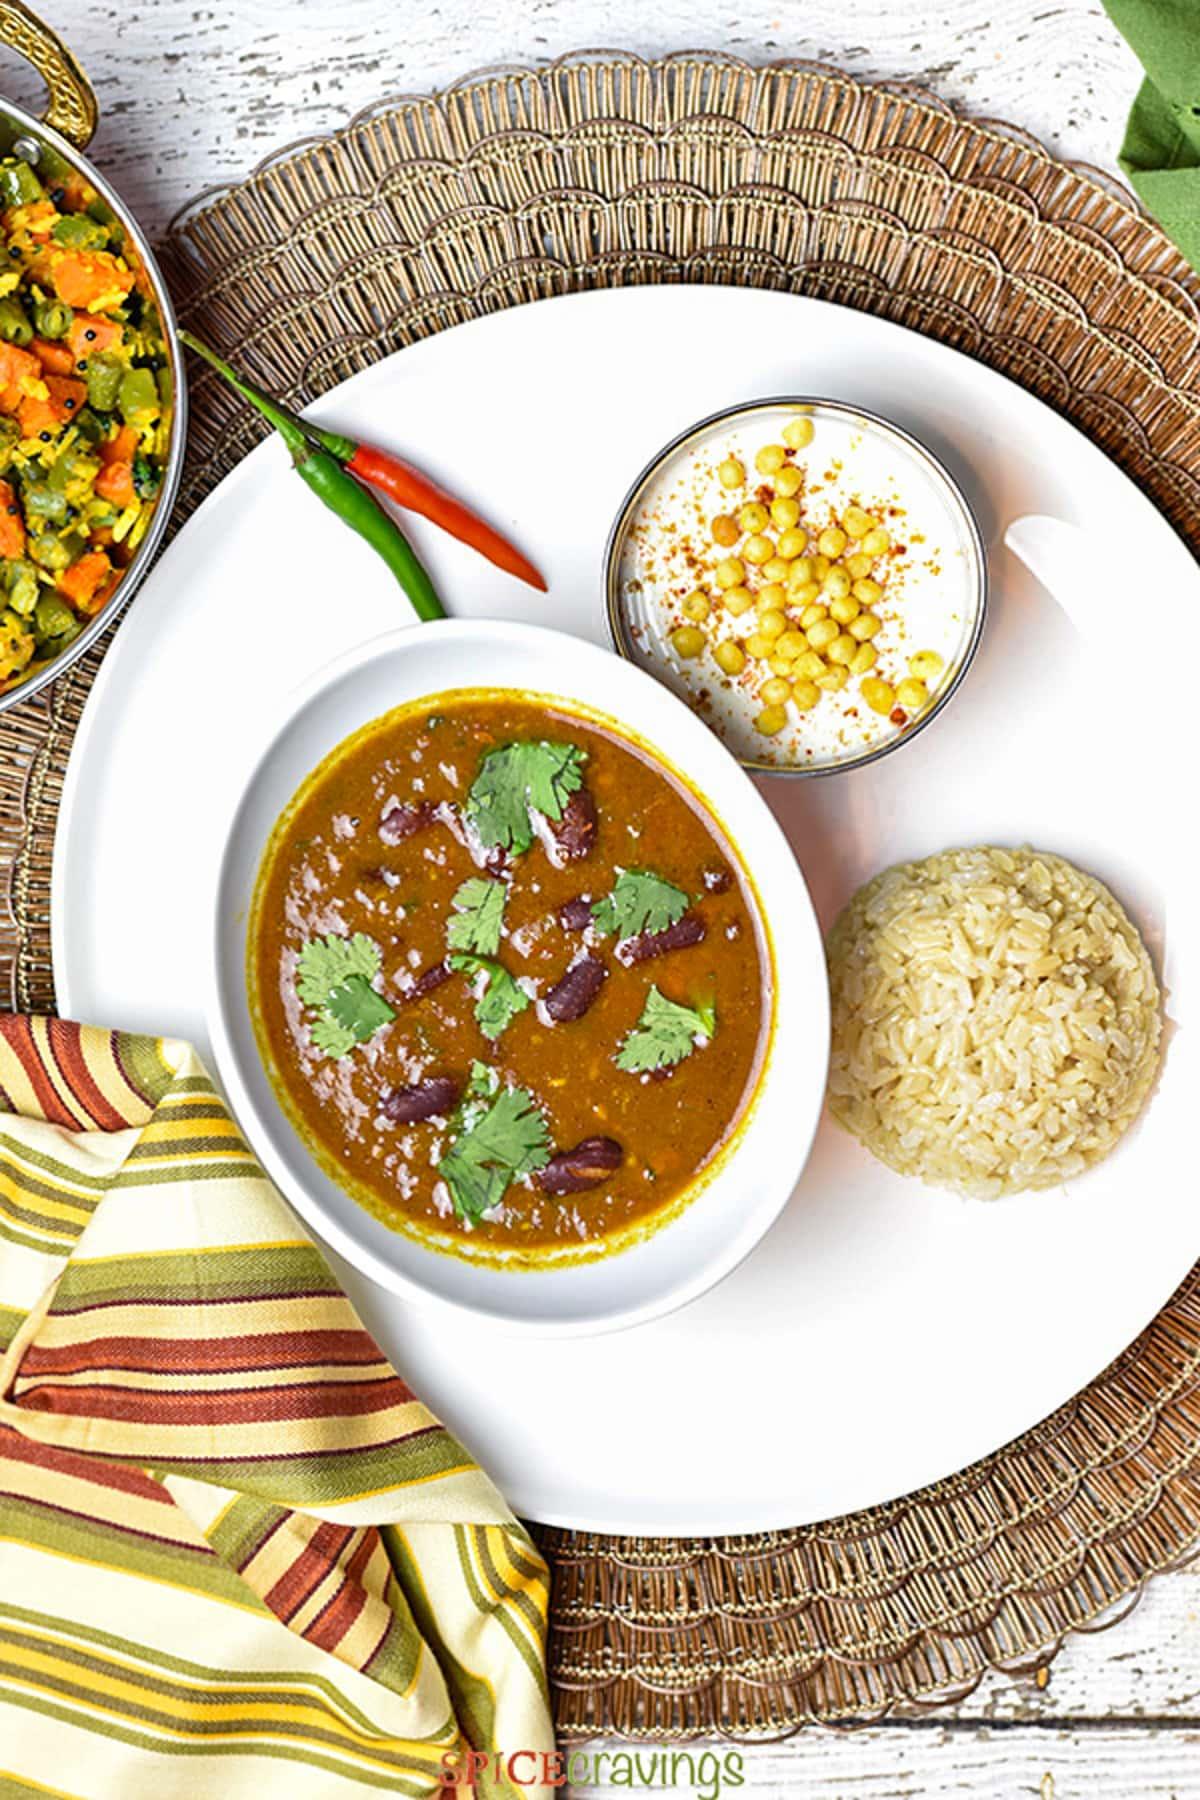 Rajma masala served with brown rice and boondi raita